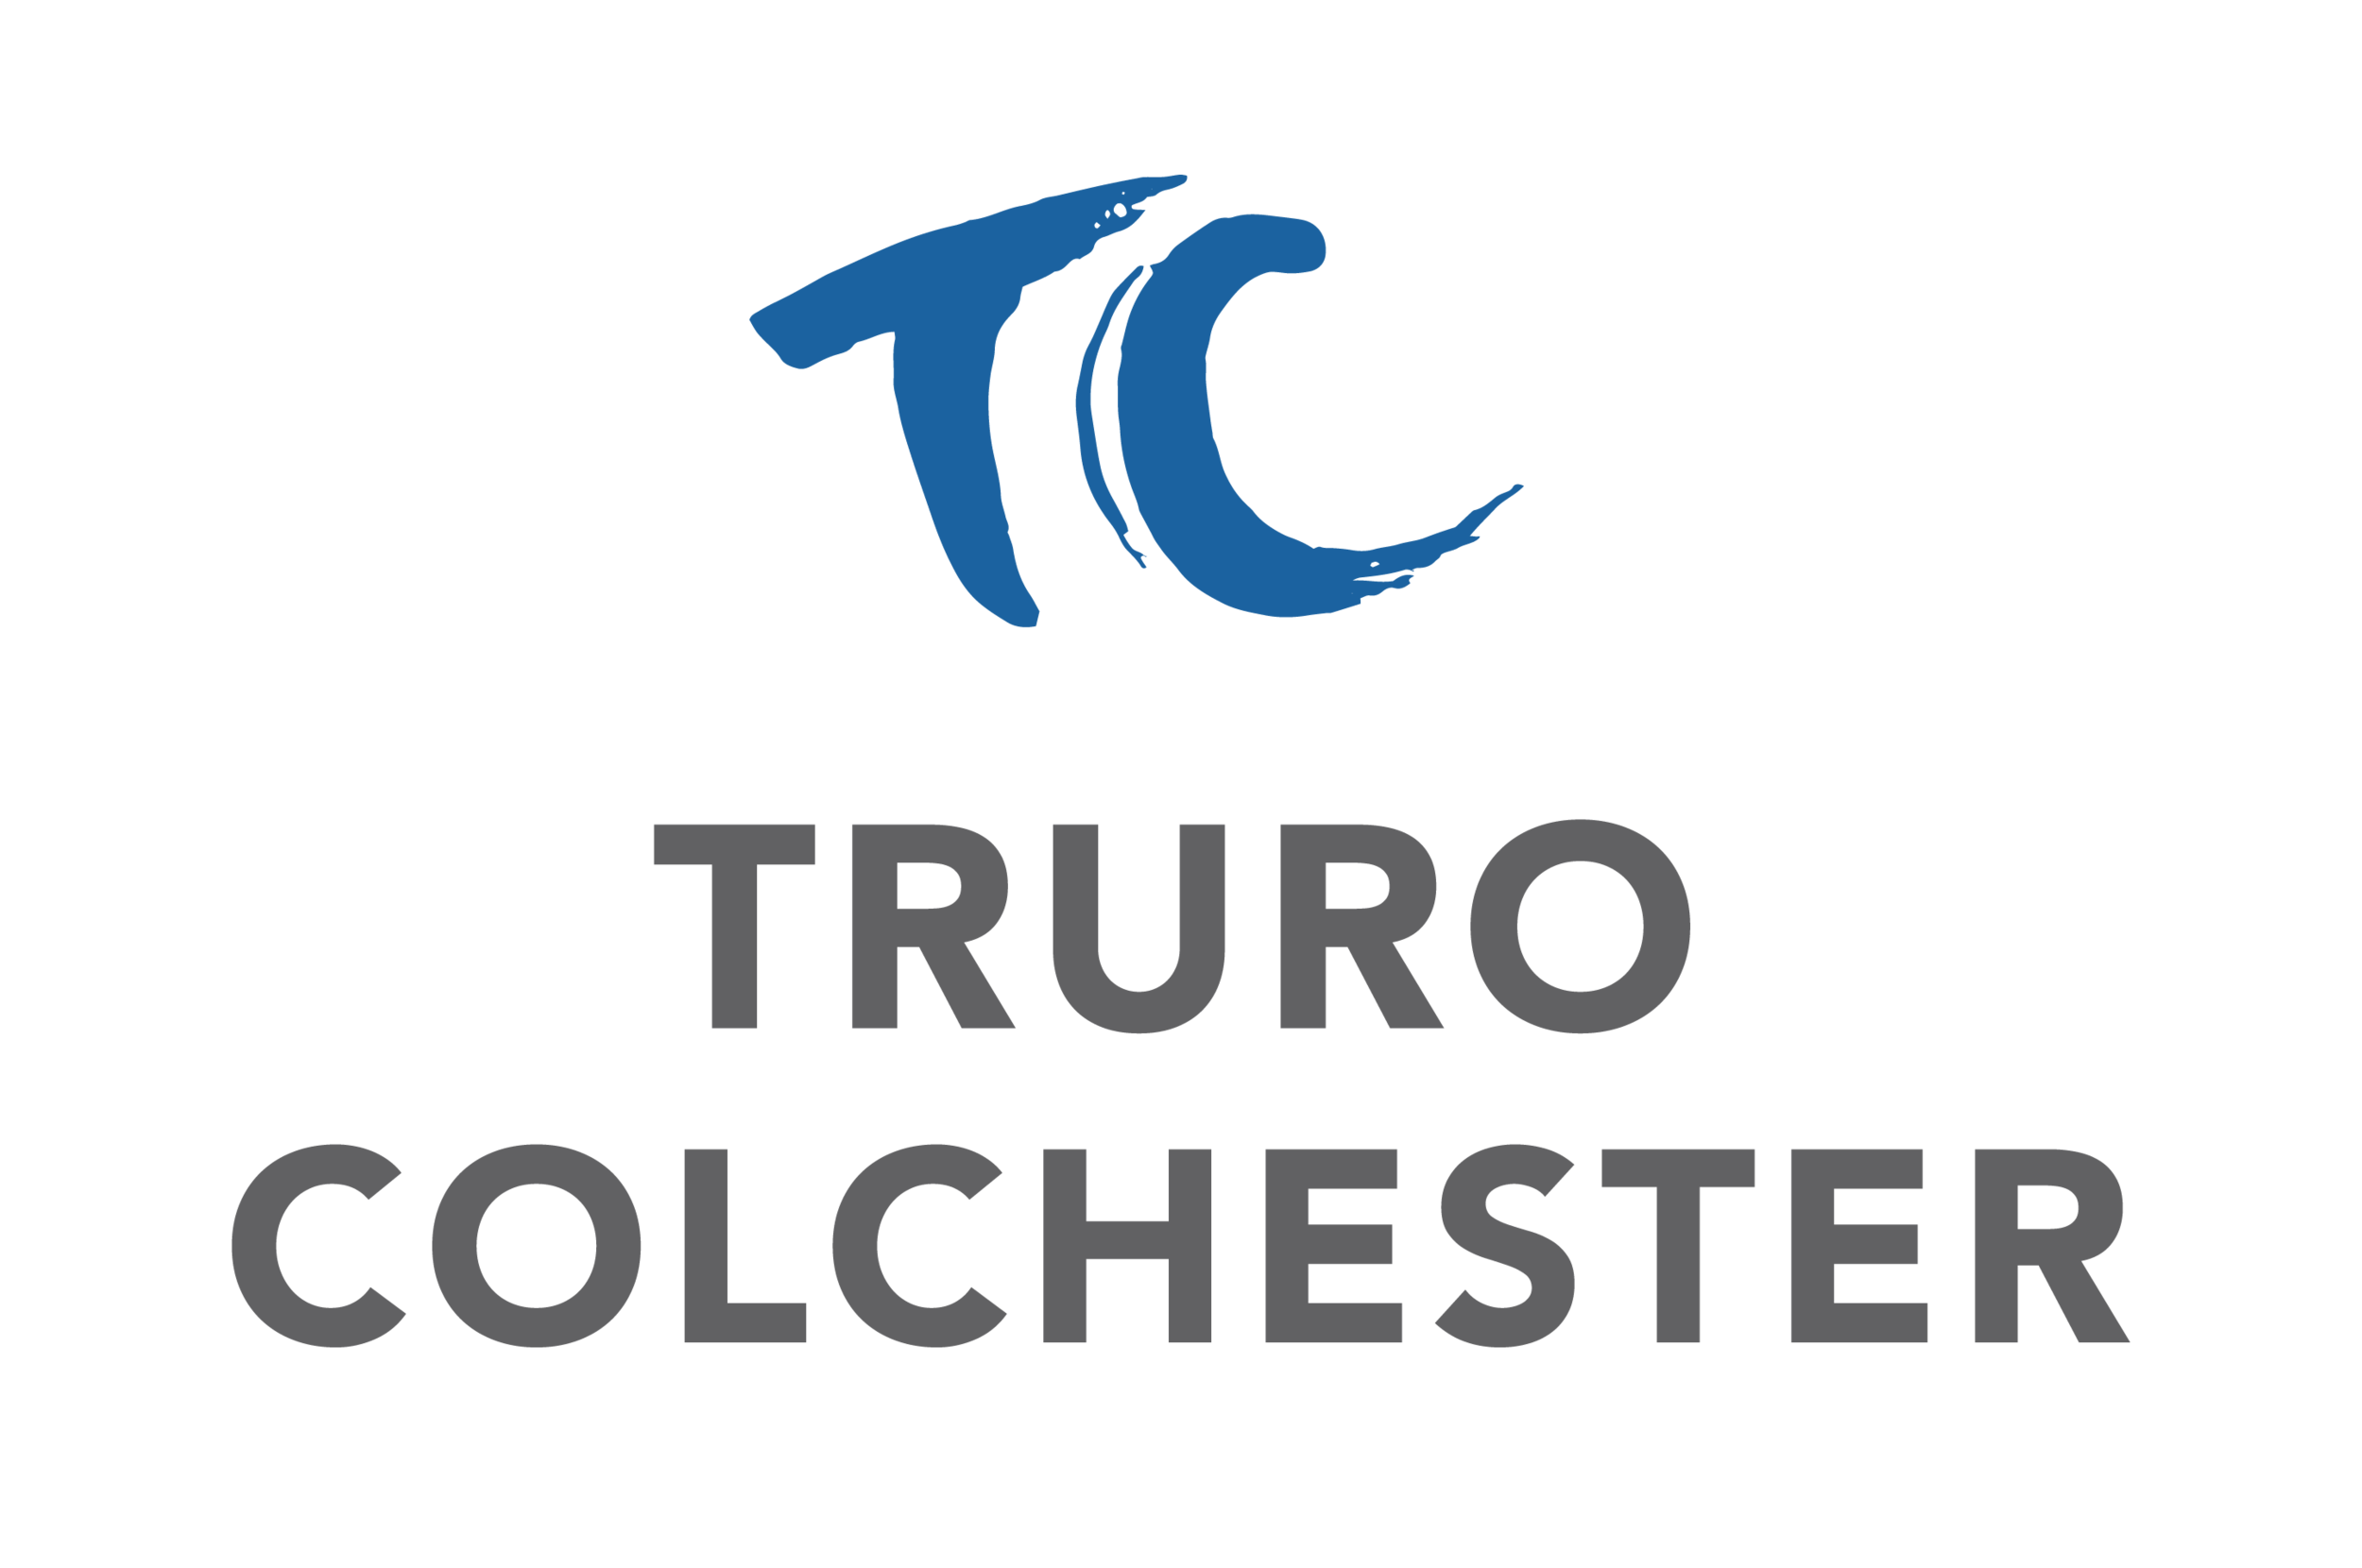 Truro Colchester Logo Color.png